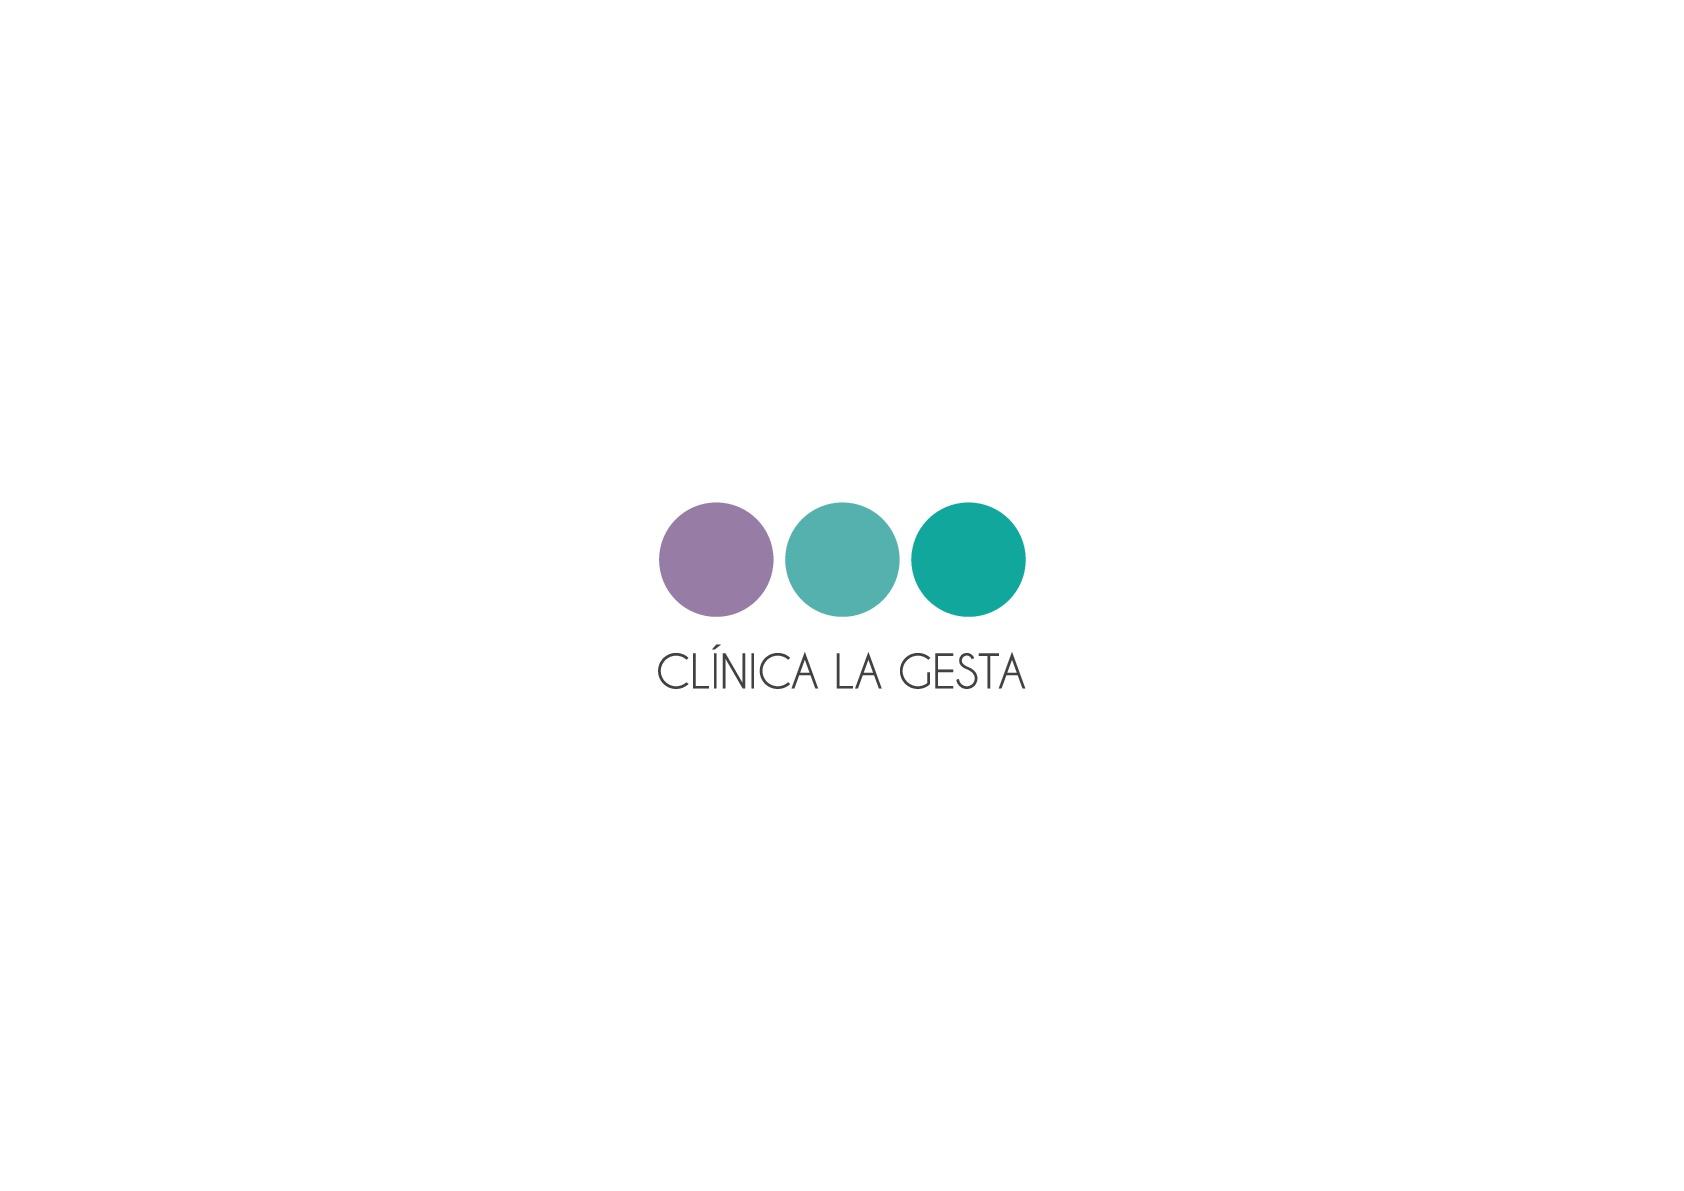 CLINICA LA GESTA _logo-001